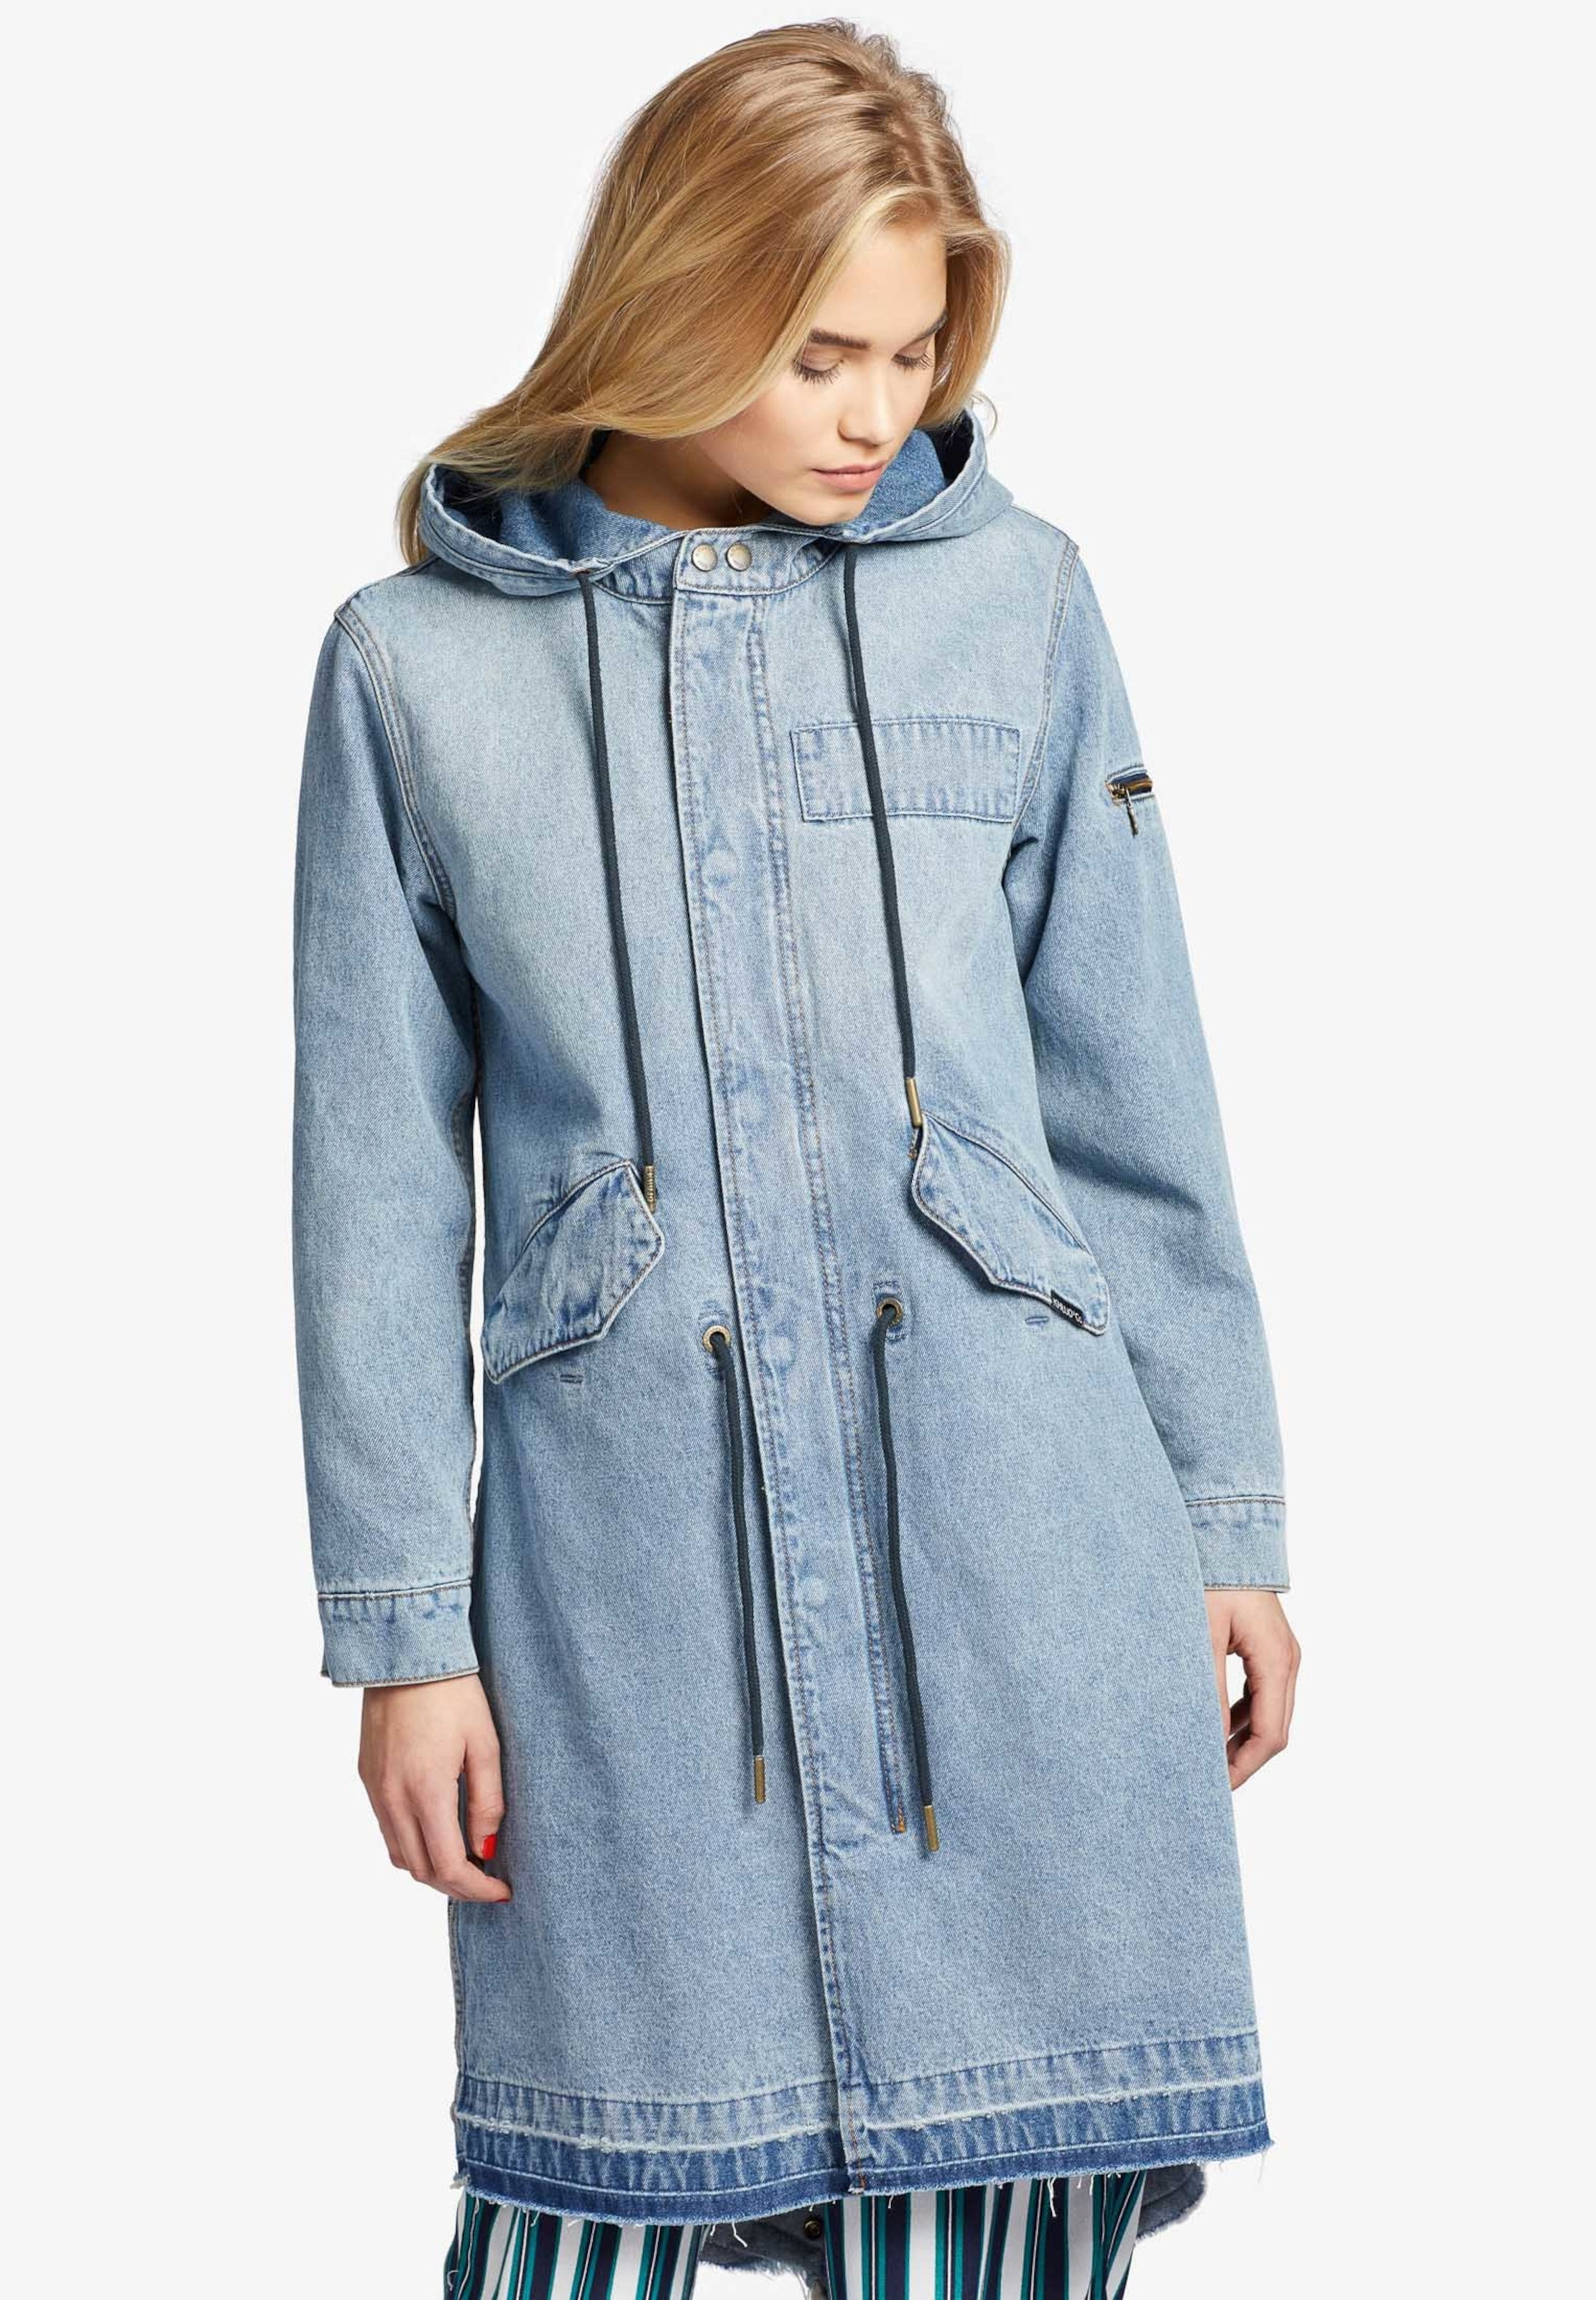 Manteau Khujo Mi En saison Blau 'miranda' tQsdrh